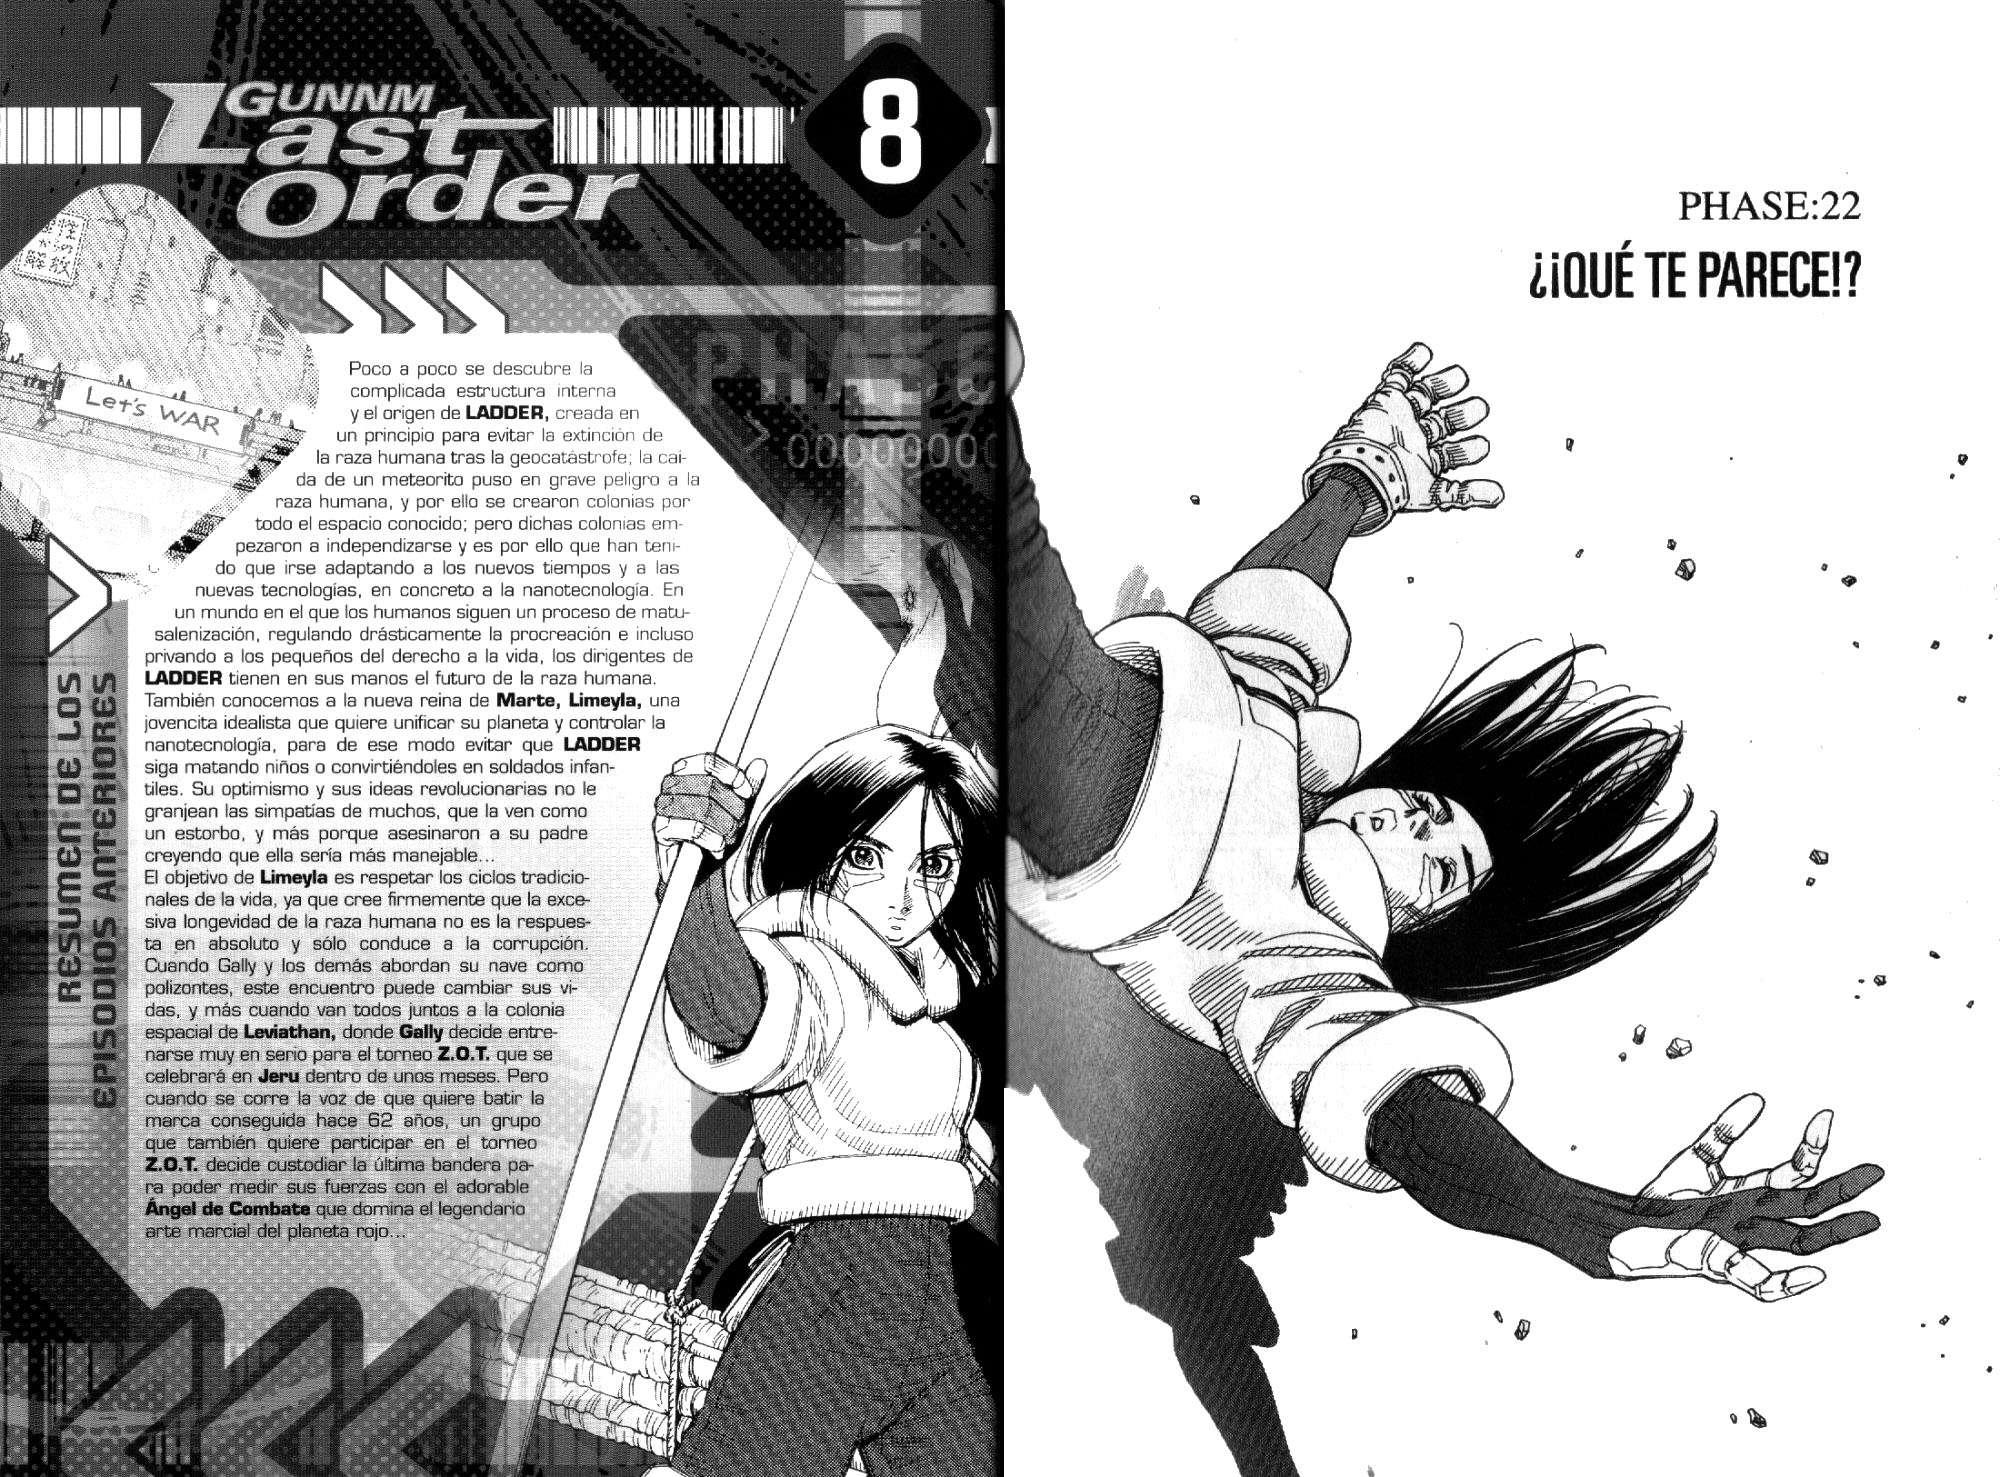 http://c5.ninemanga.com/es_manga/1/15873/402034/9f369b3d166fd7623b321cfe91ca4c9f.jpg Page 2